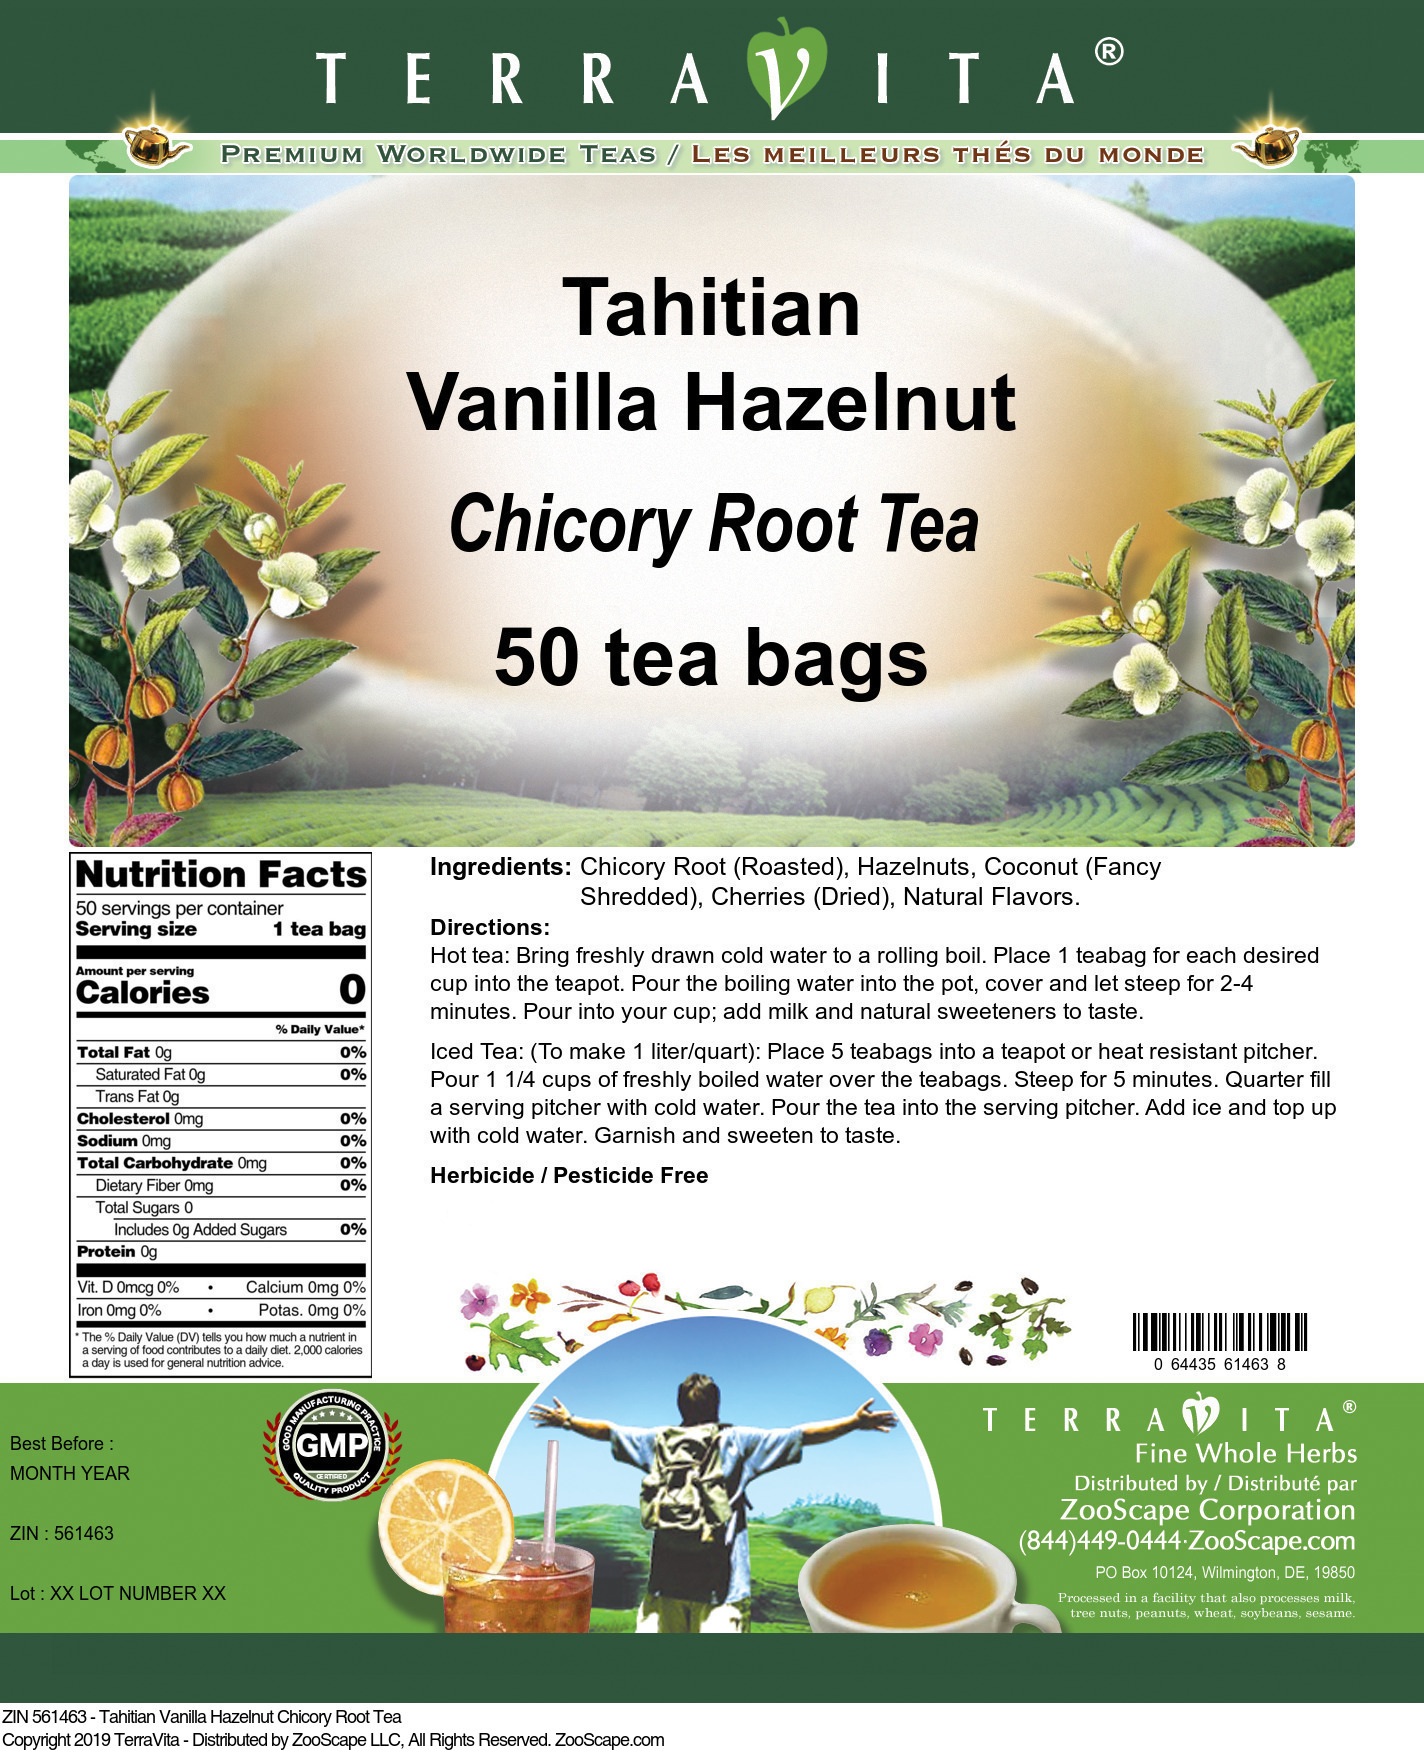 Tahitian Vanilla Hazelnut Chicory Root